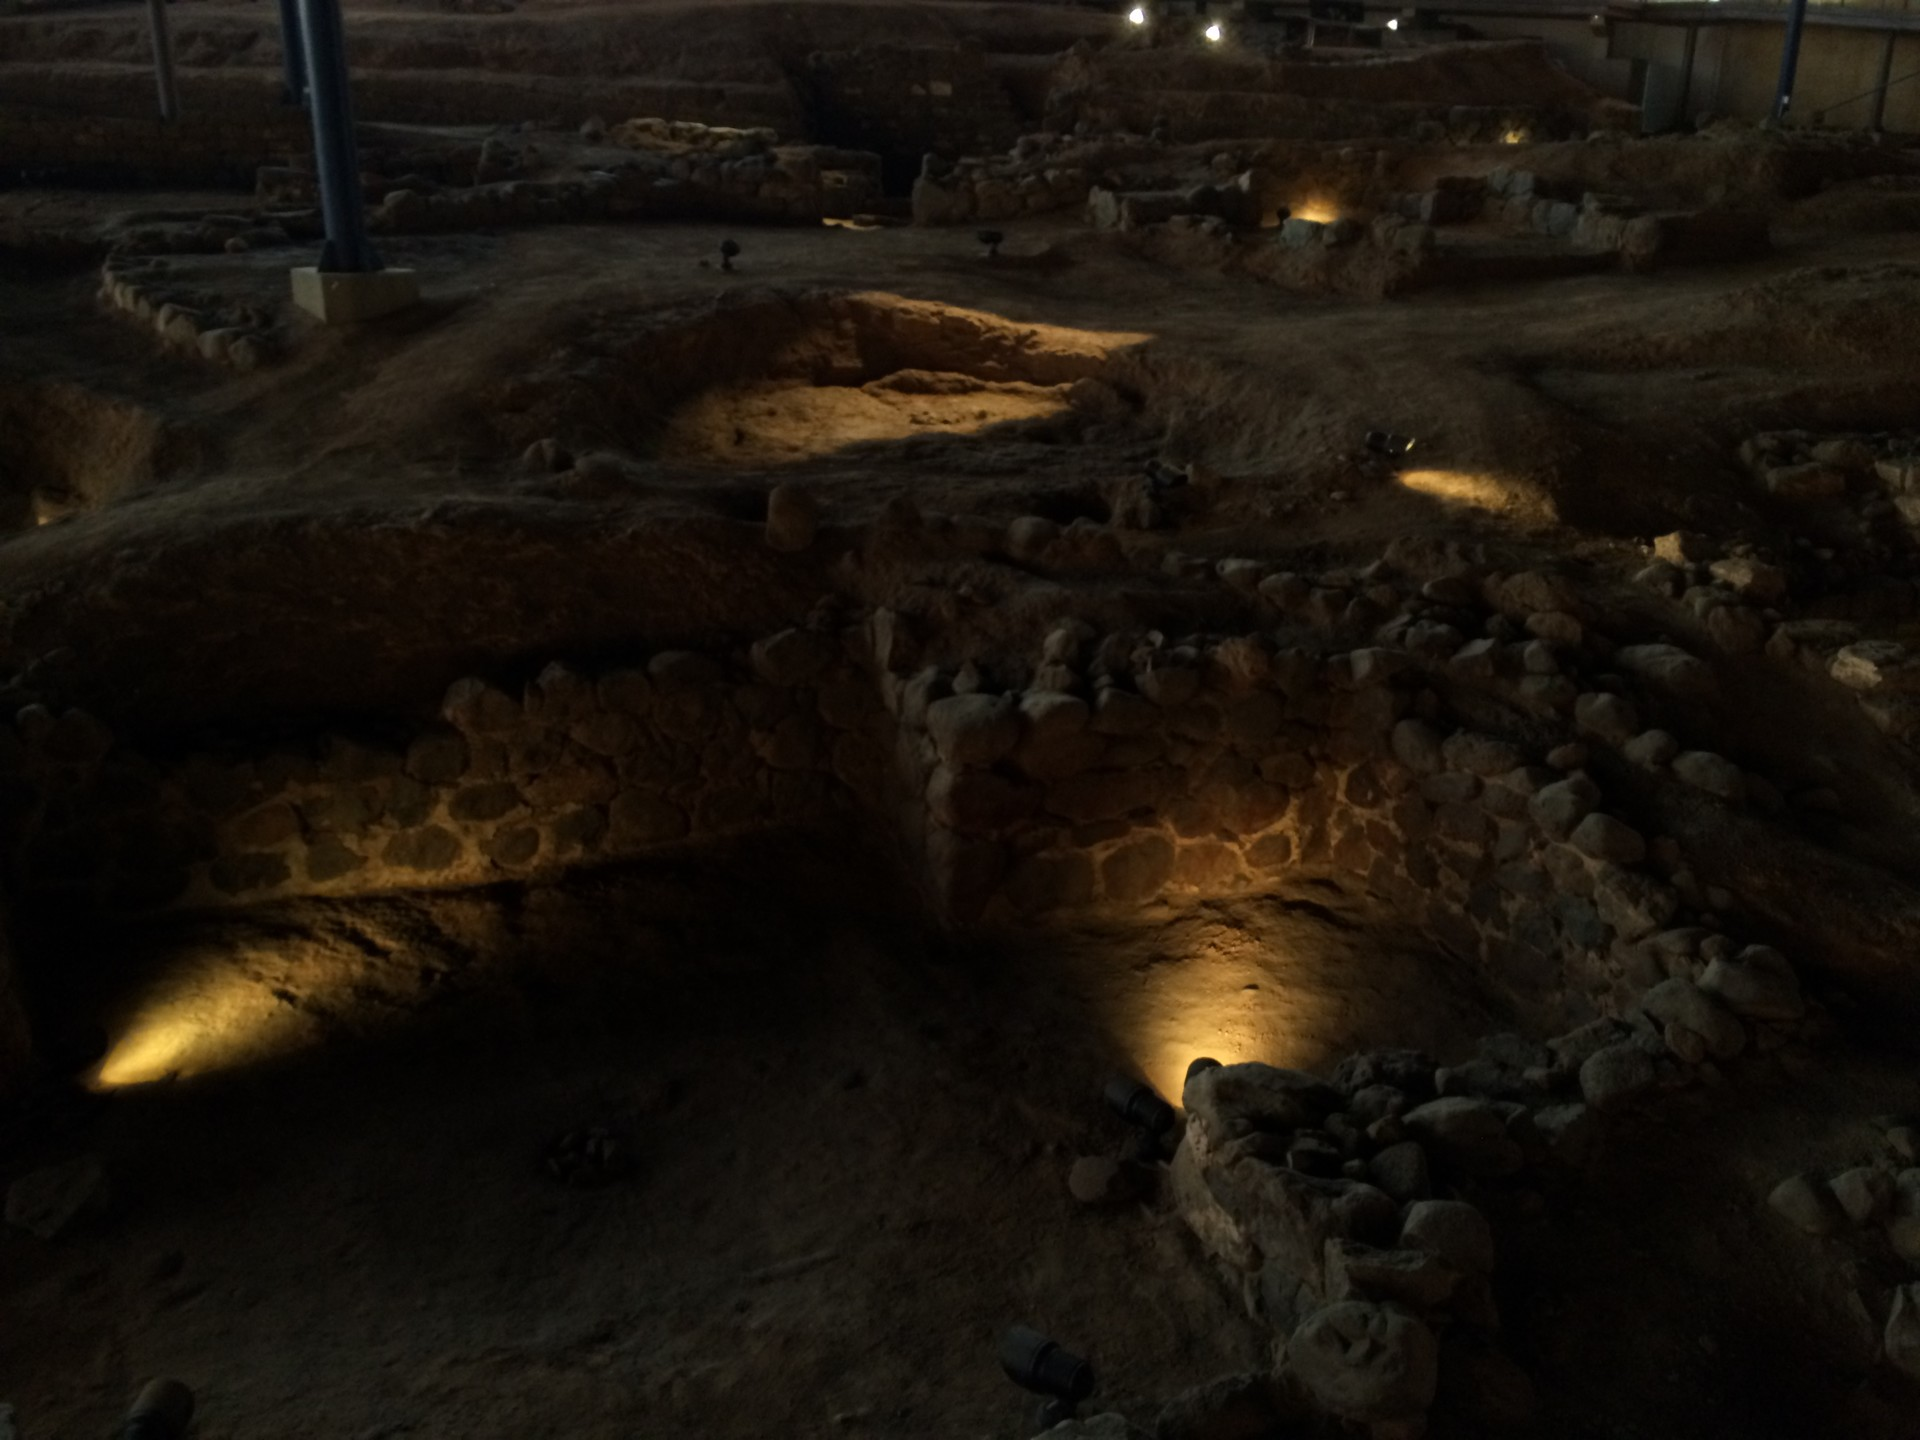 cueva-pintada-galdar-8eefd8622b2235be548